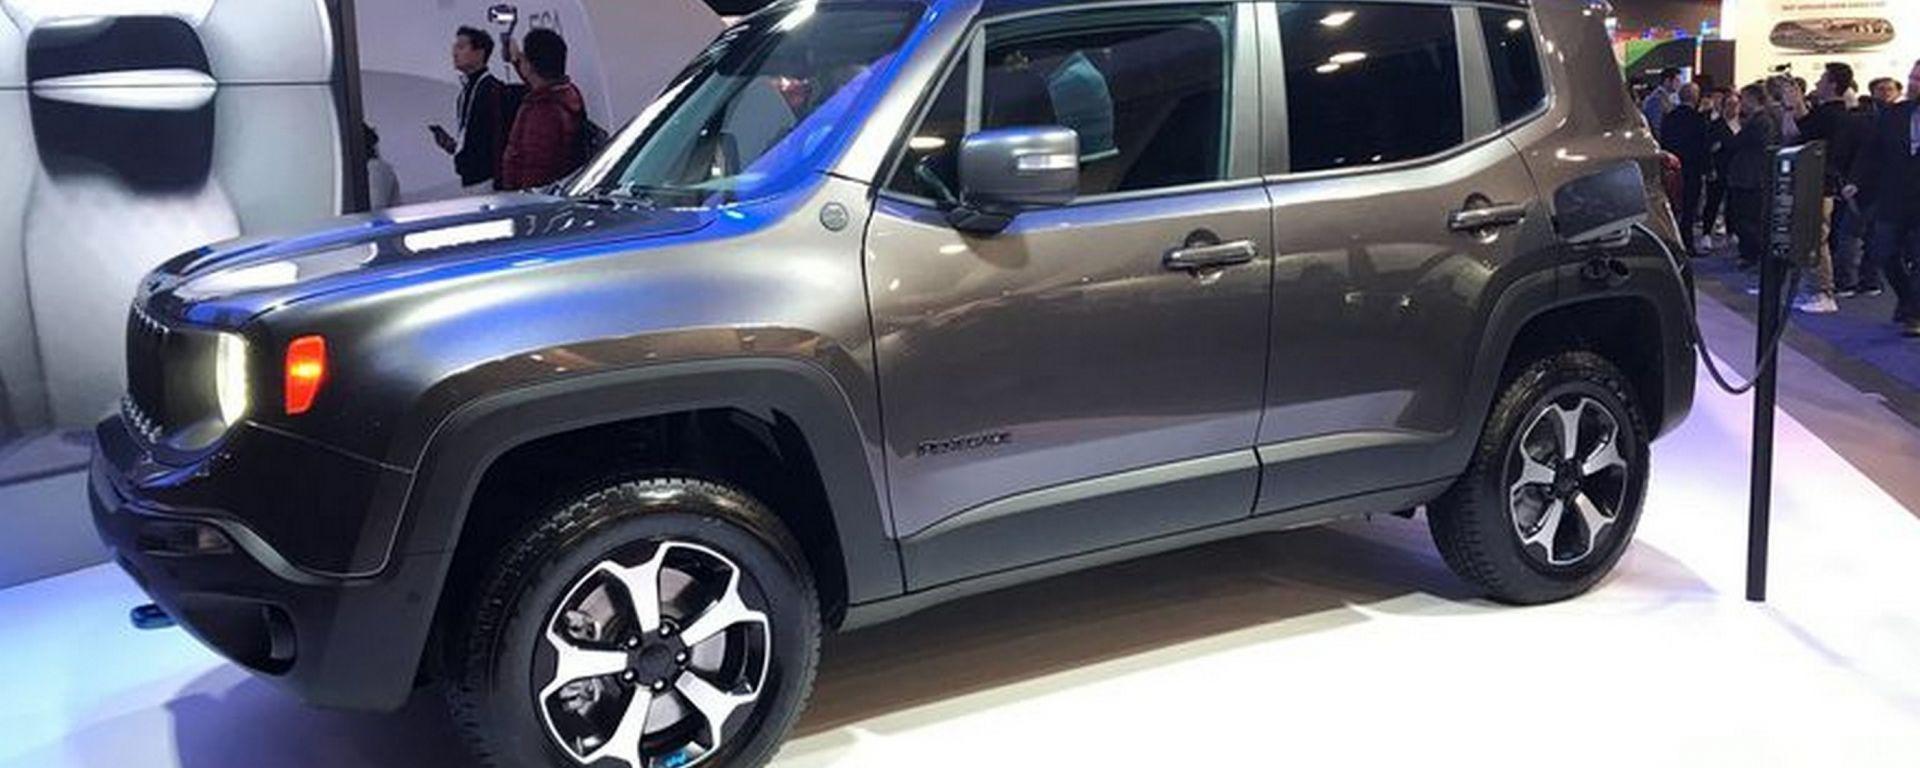 Jeep Renegade ibrida plug-in, anteprima USA al CES 2020